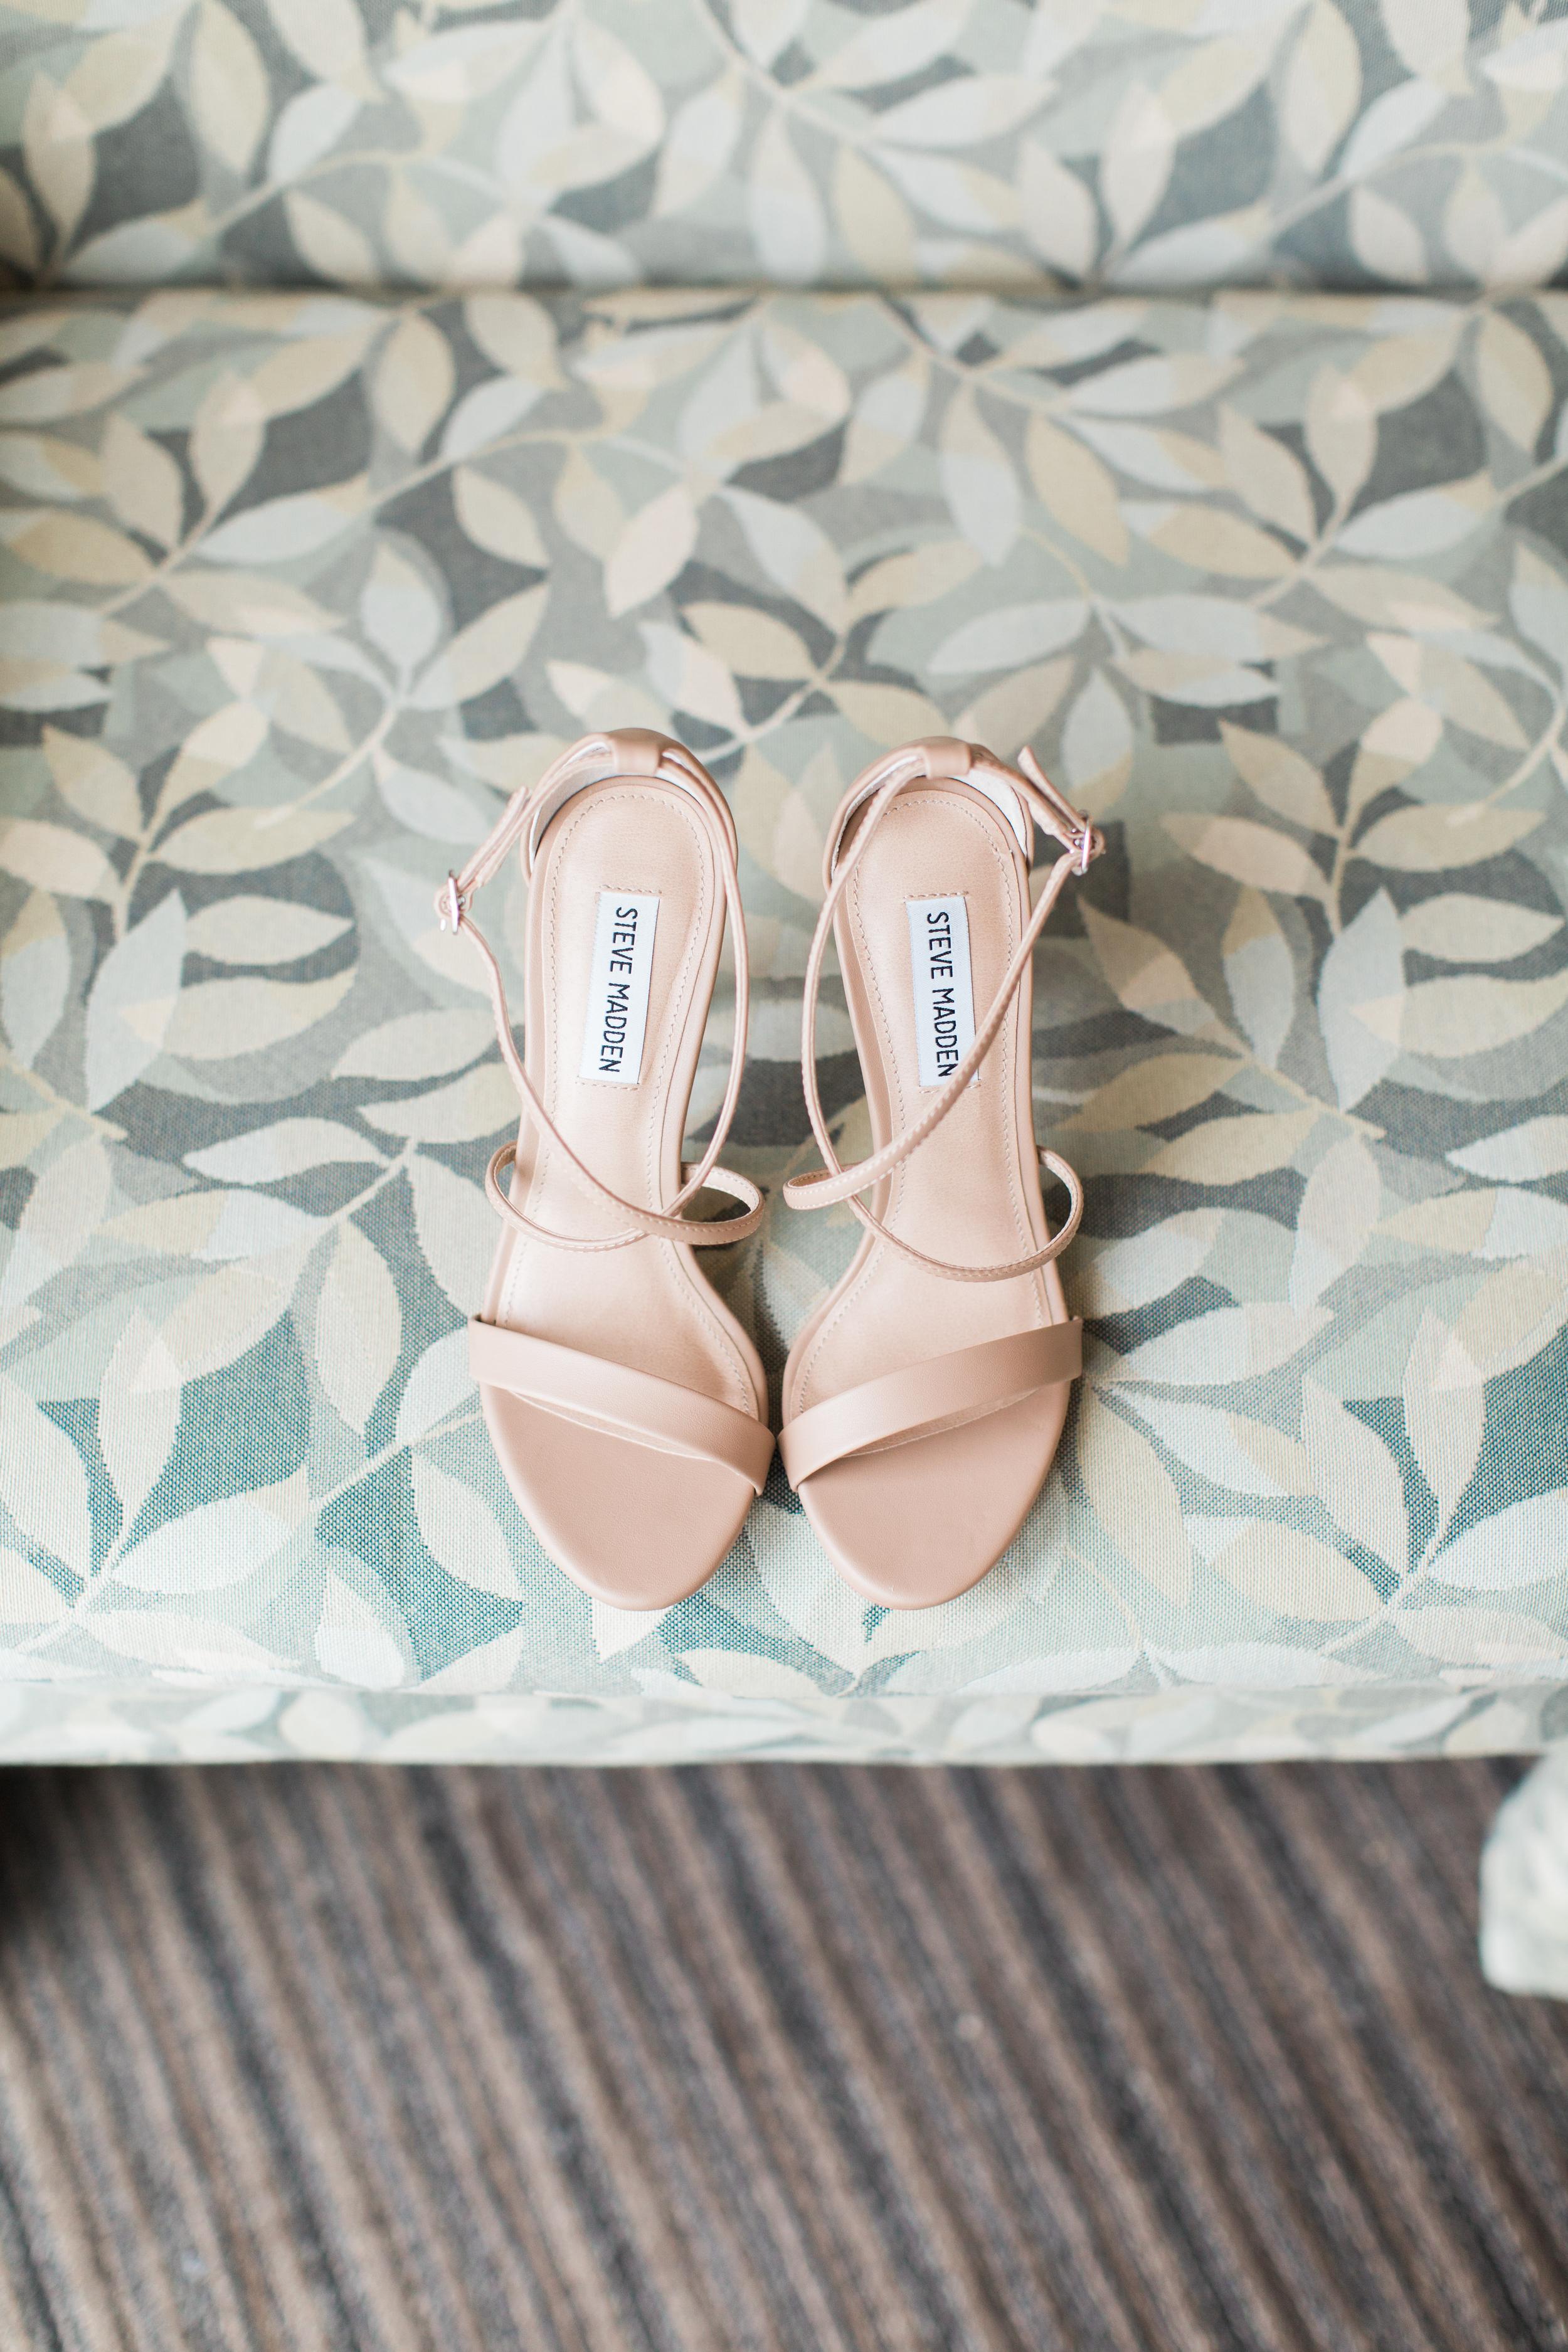 05-wedding-shoes-on-chair.jpg